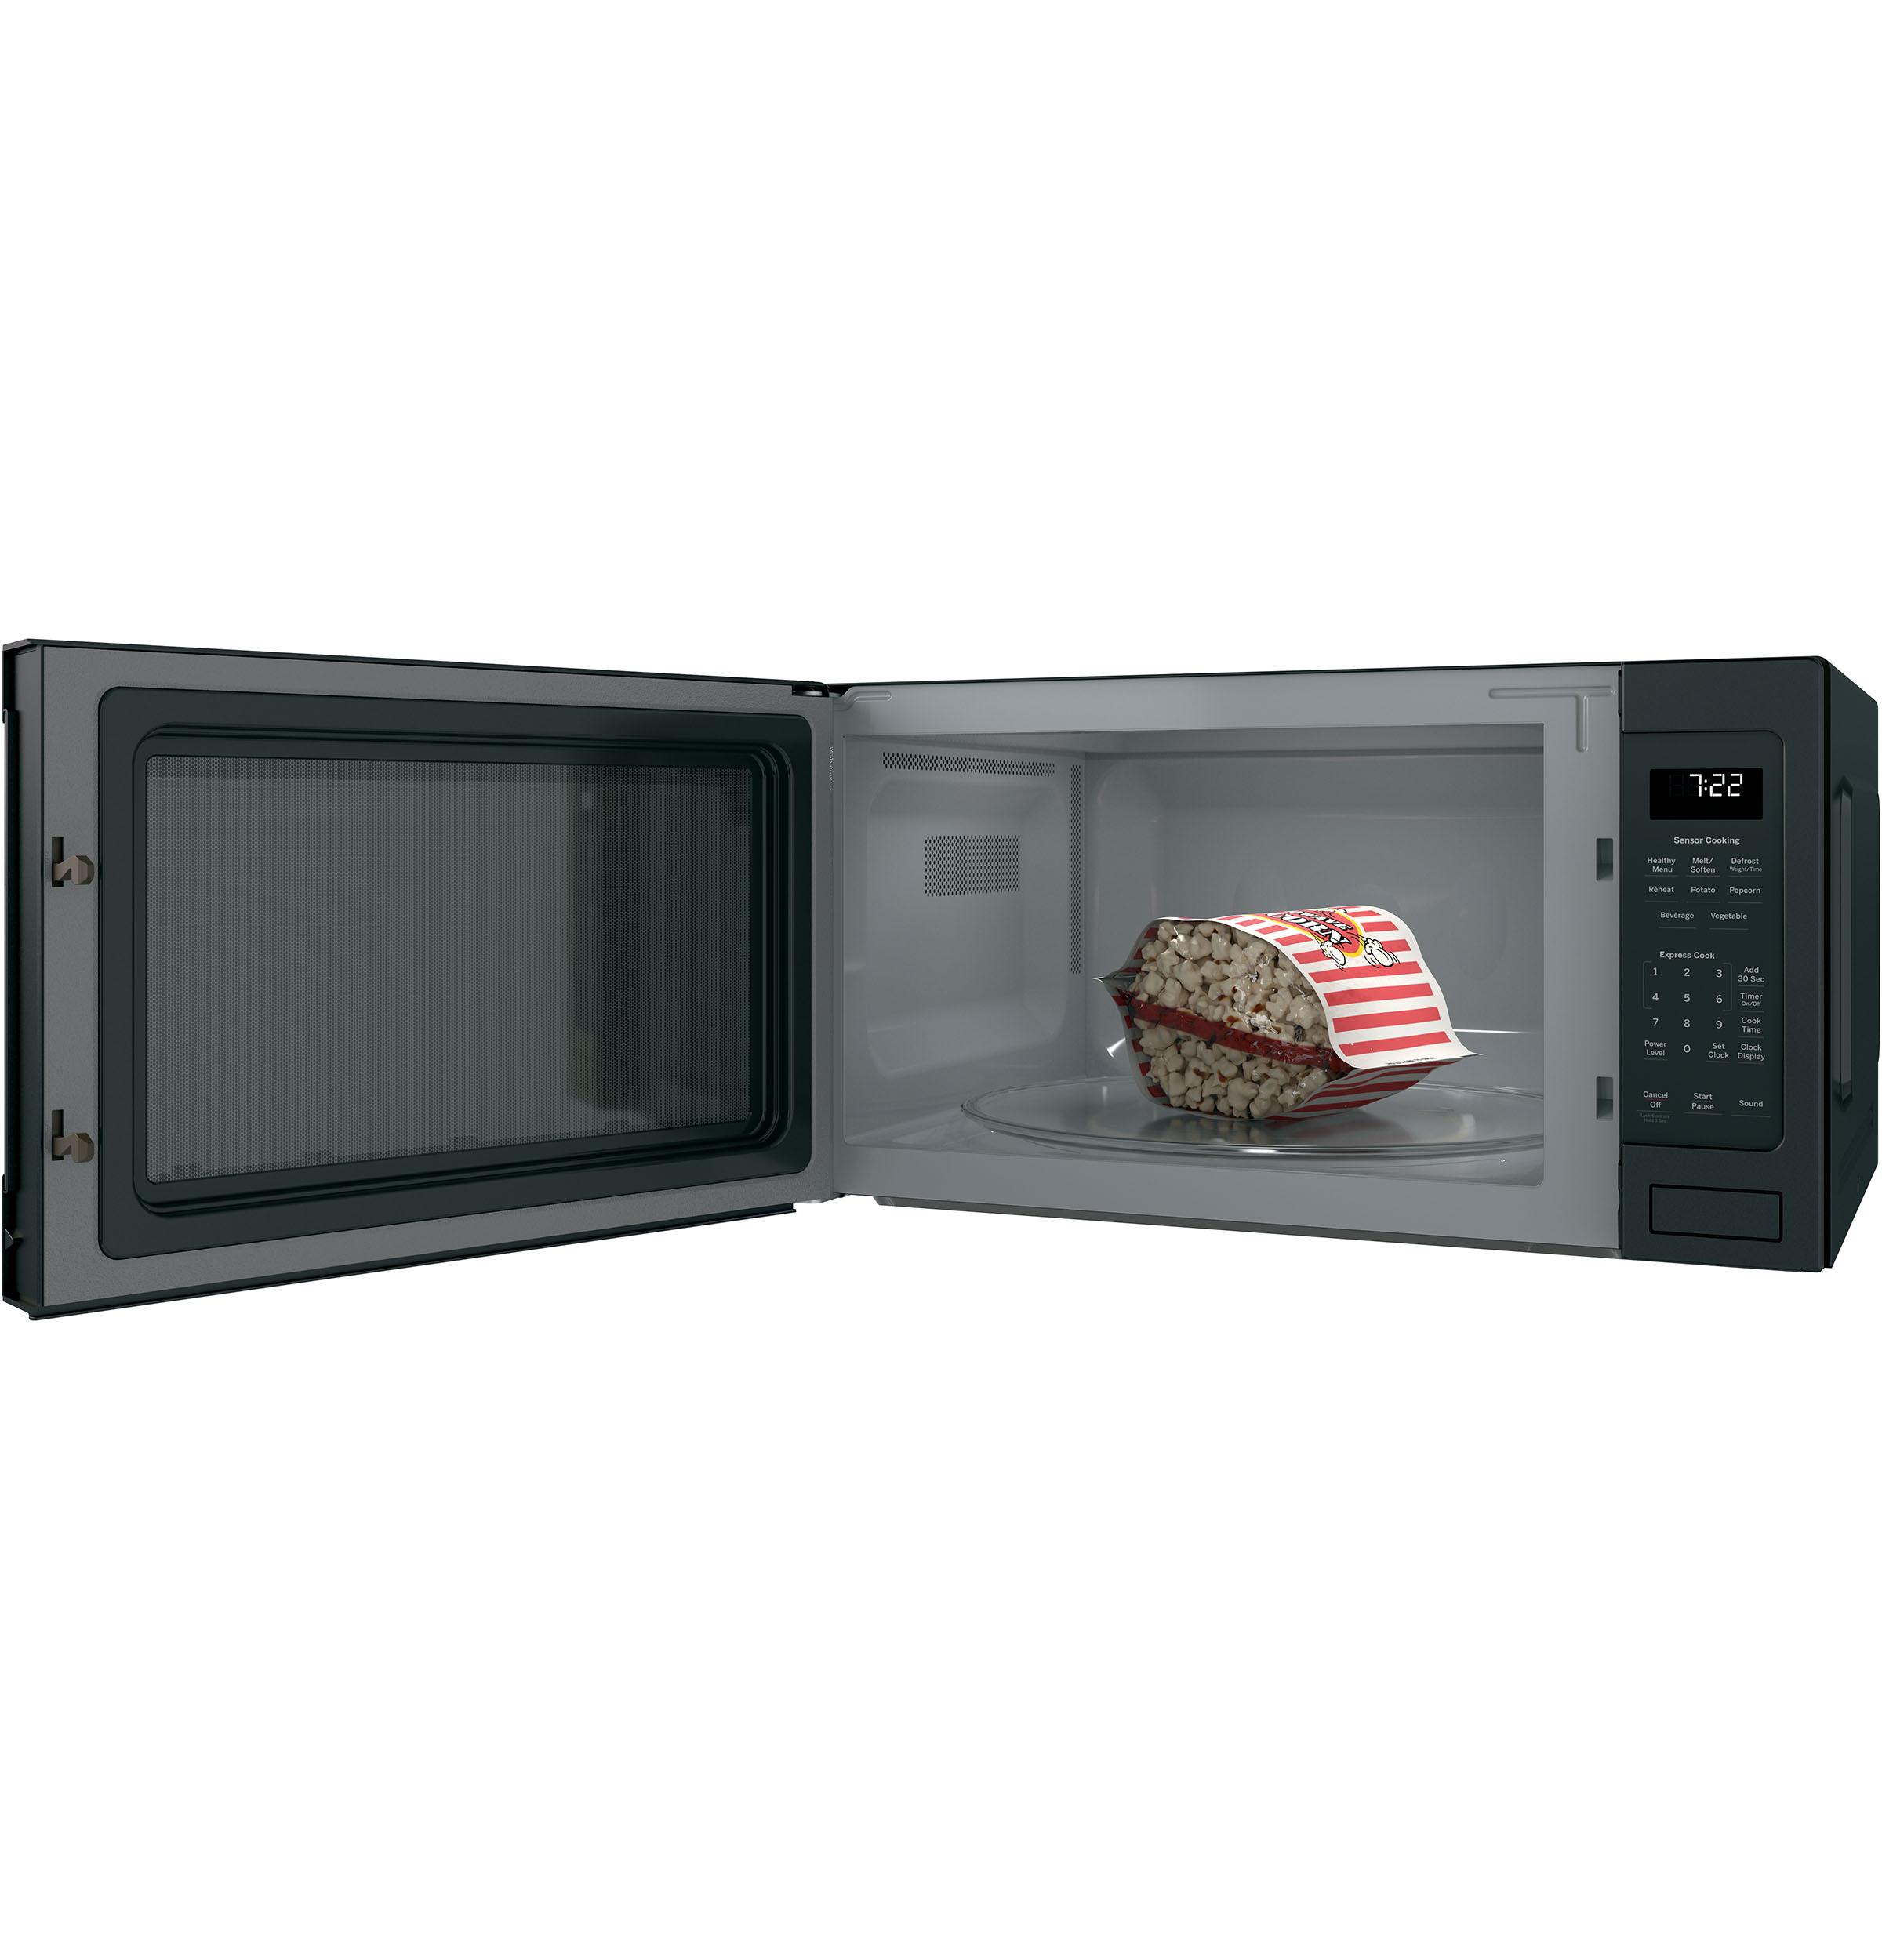 Model: PES7227FMDS | GE Profile™ Series 2.2 Cu. Ft. Countertop Sensor Microwave Oven